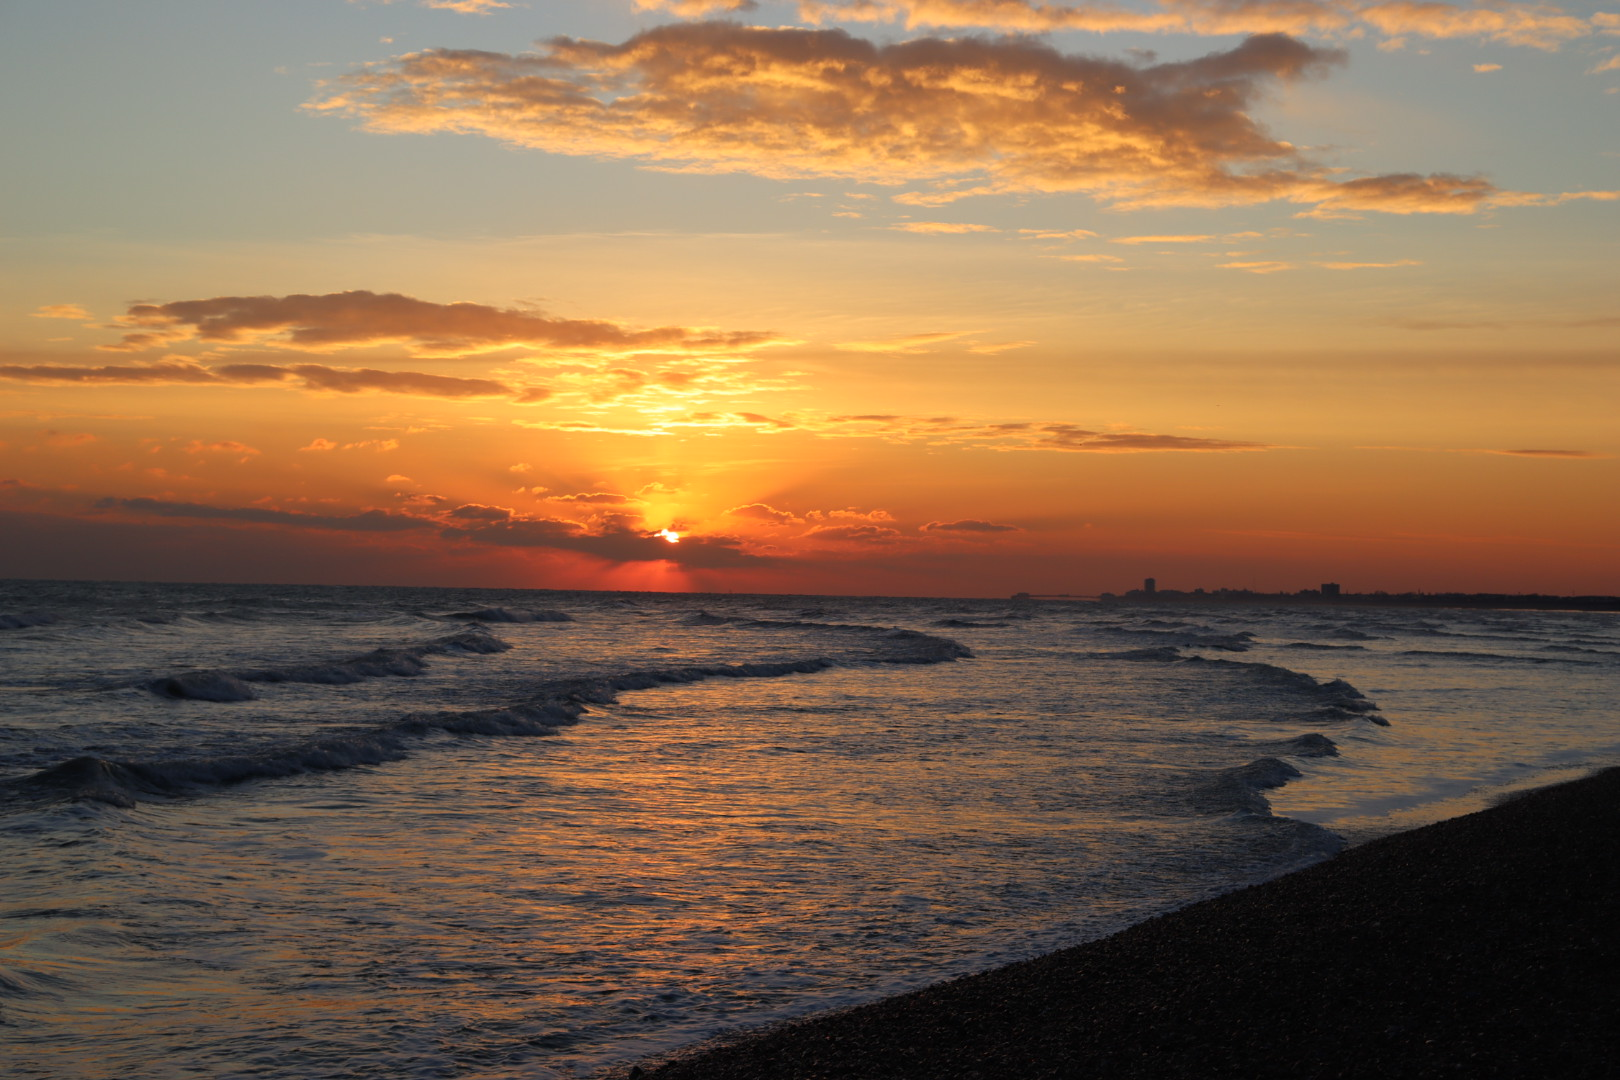 Rippling waves beneath an orange sky as the sun sets.